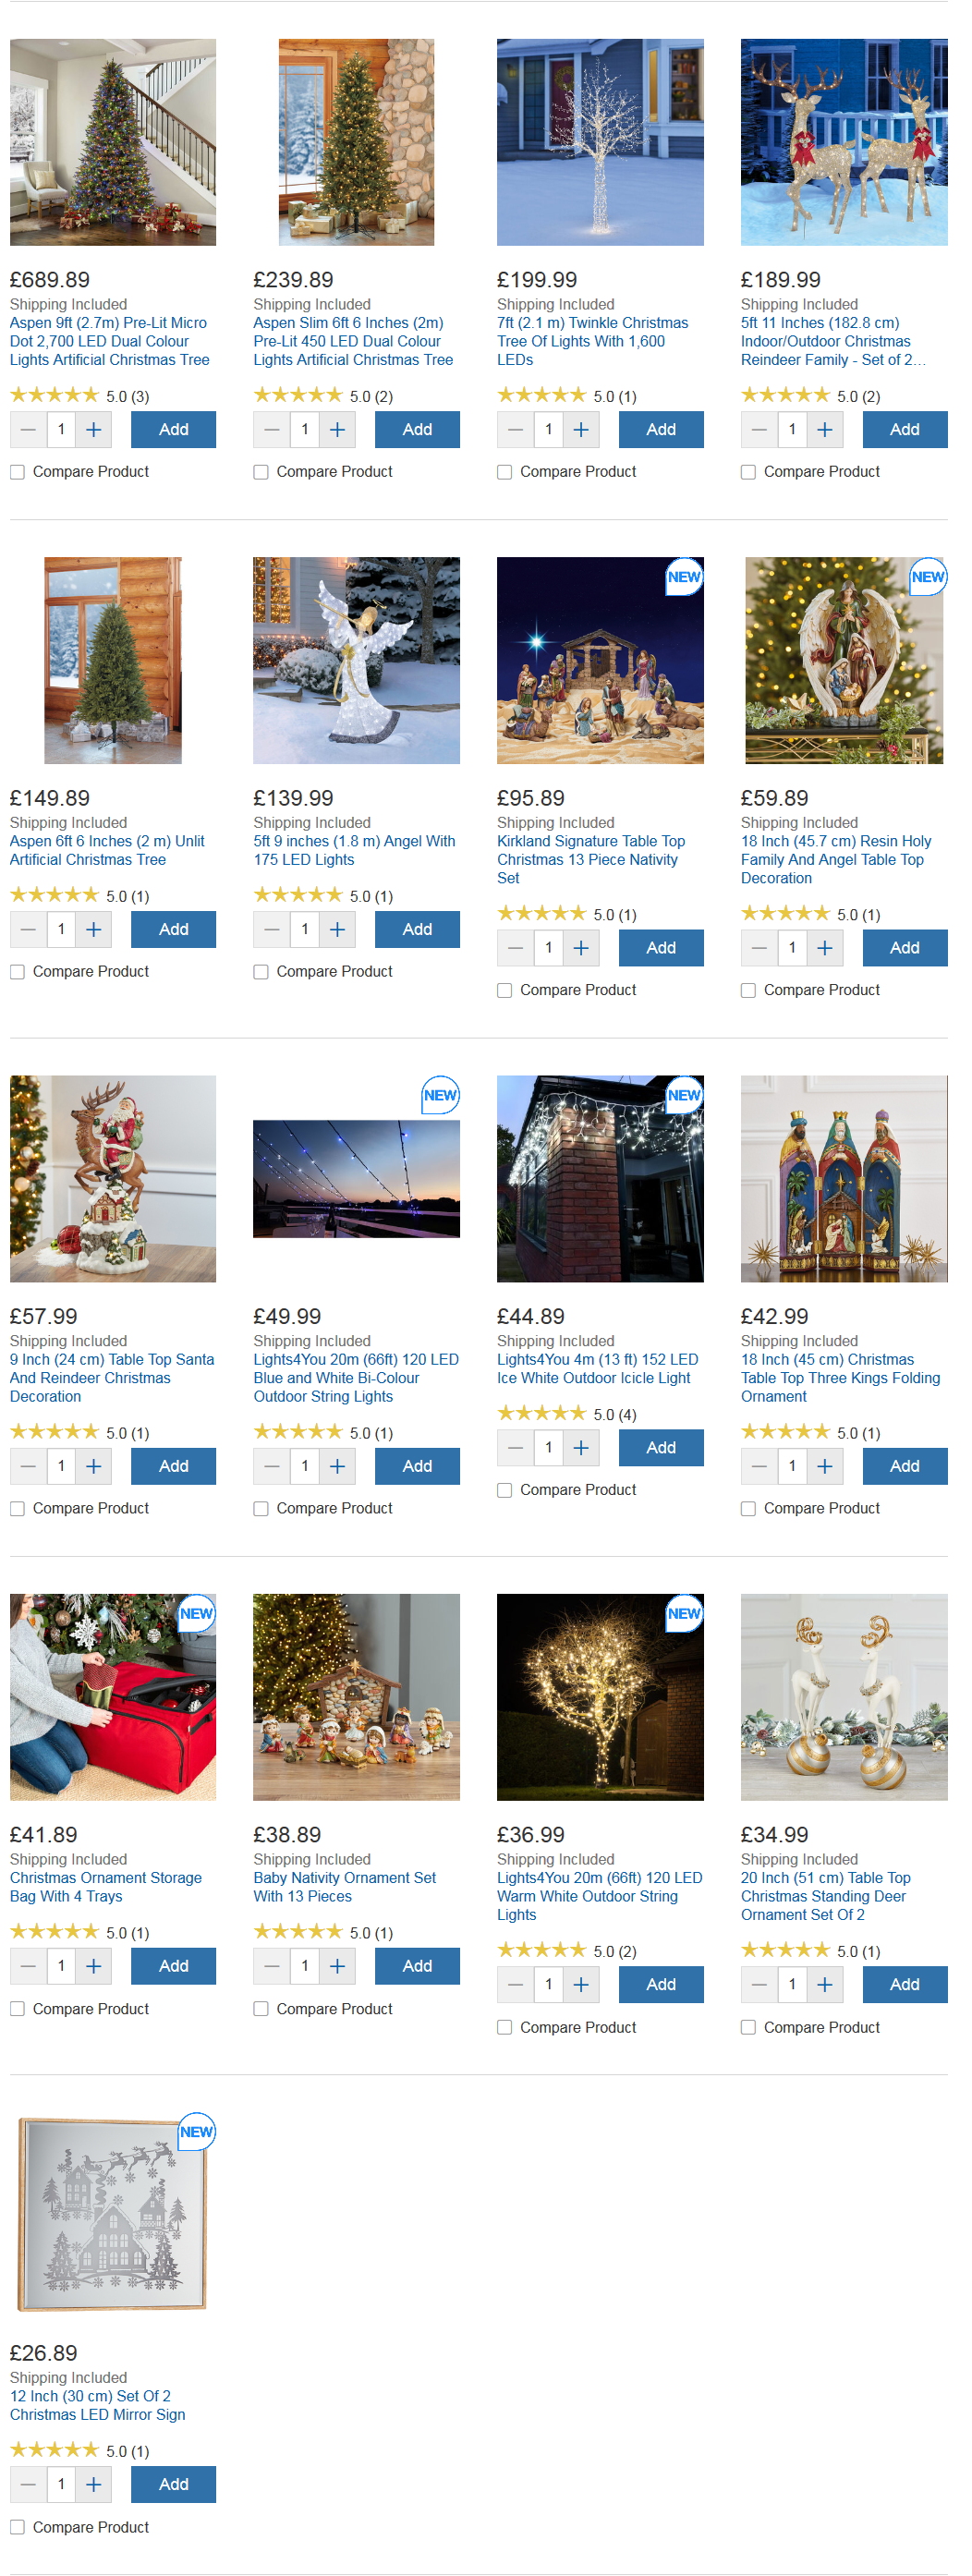 Costco Christmas Decorations 2020